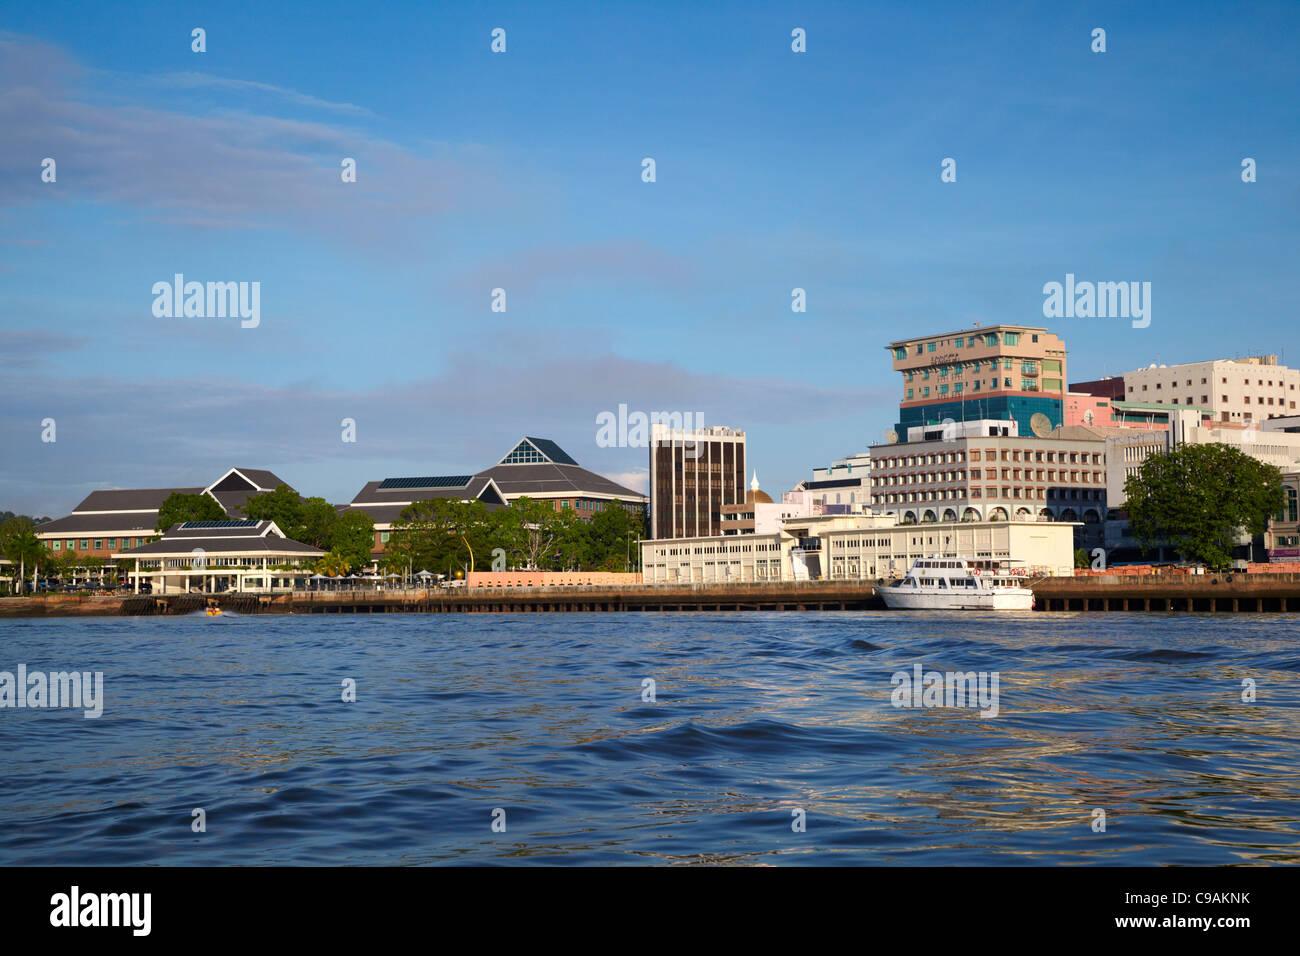 Brunei Share: Bandar Seri Begawan The Brunei Darussalam ...  |Bandar Seri Begawan Brunei Darussalam